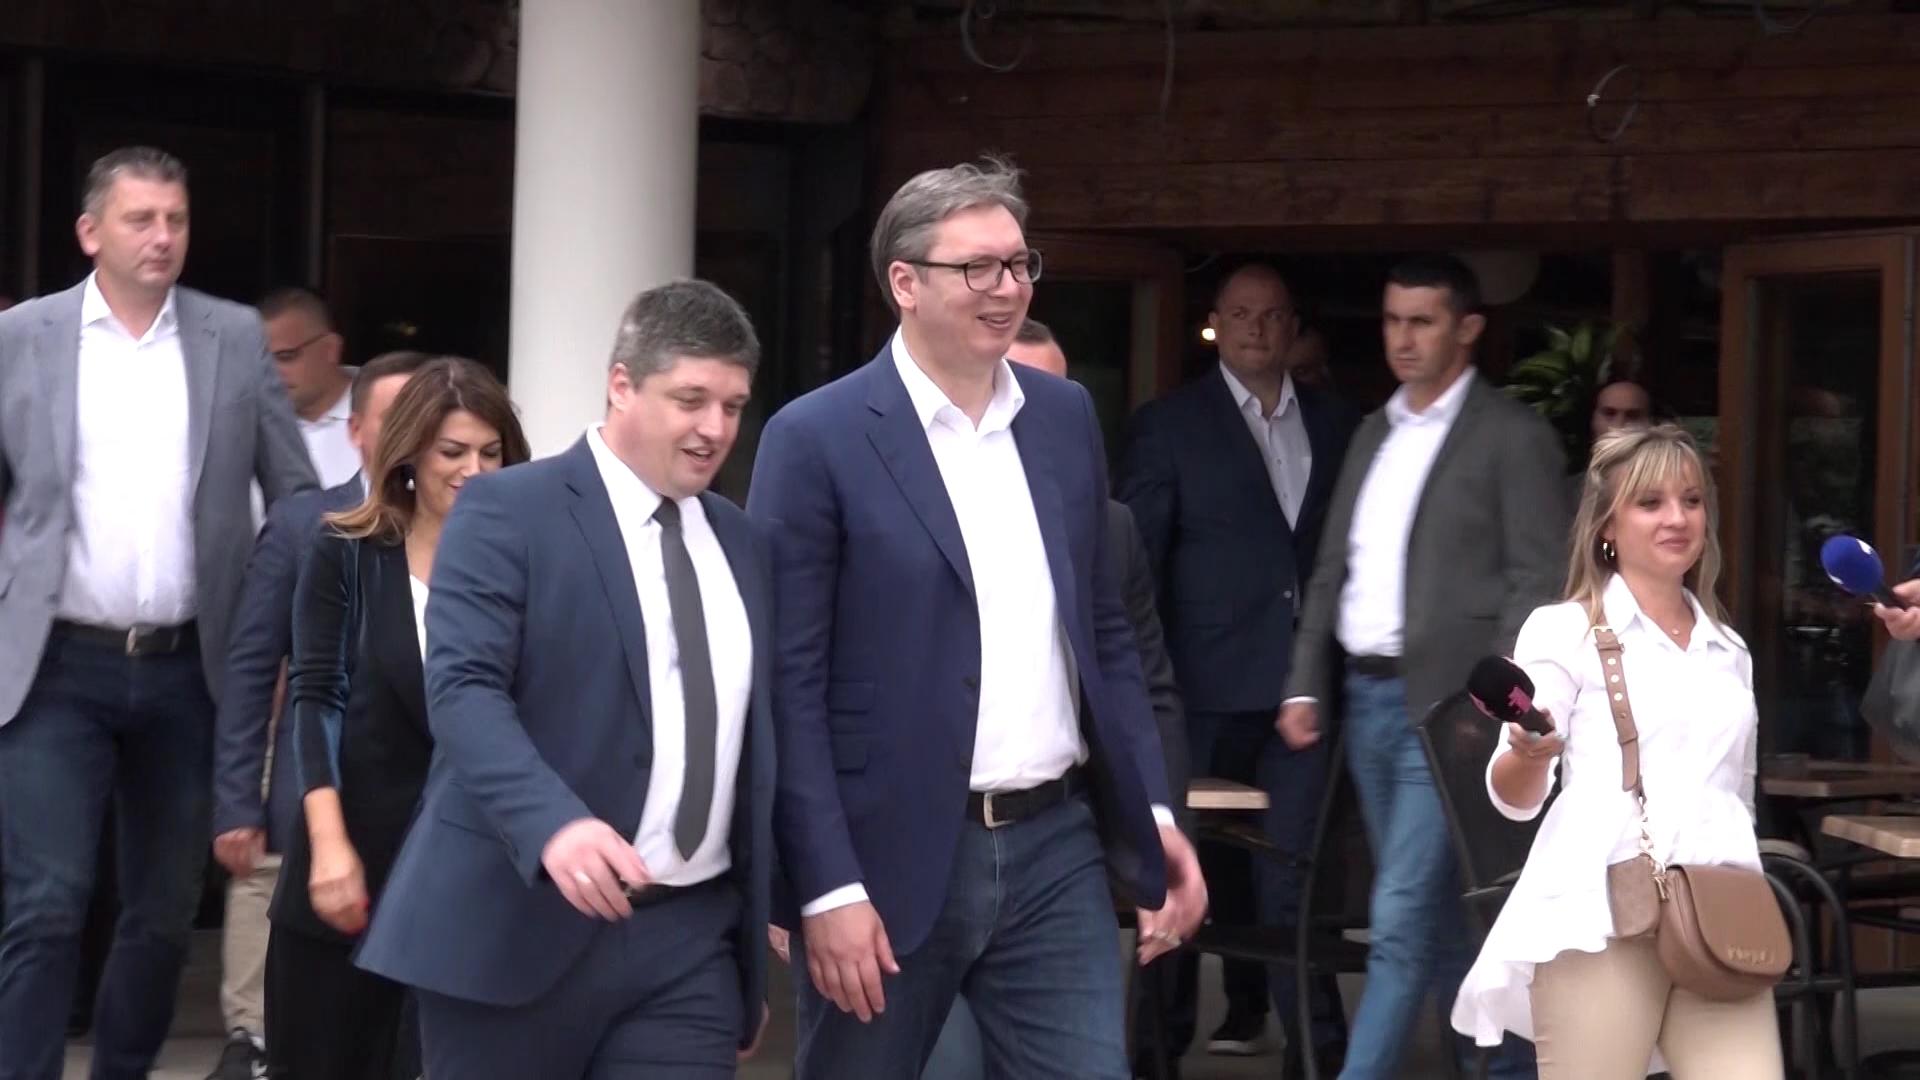 Predsednik Aleksandar Vučić u poseti Pomoravskom okrugu